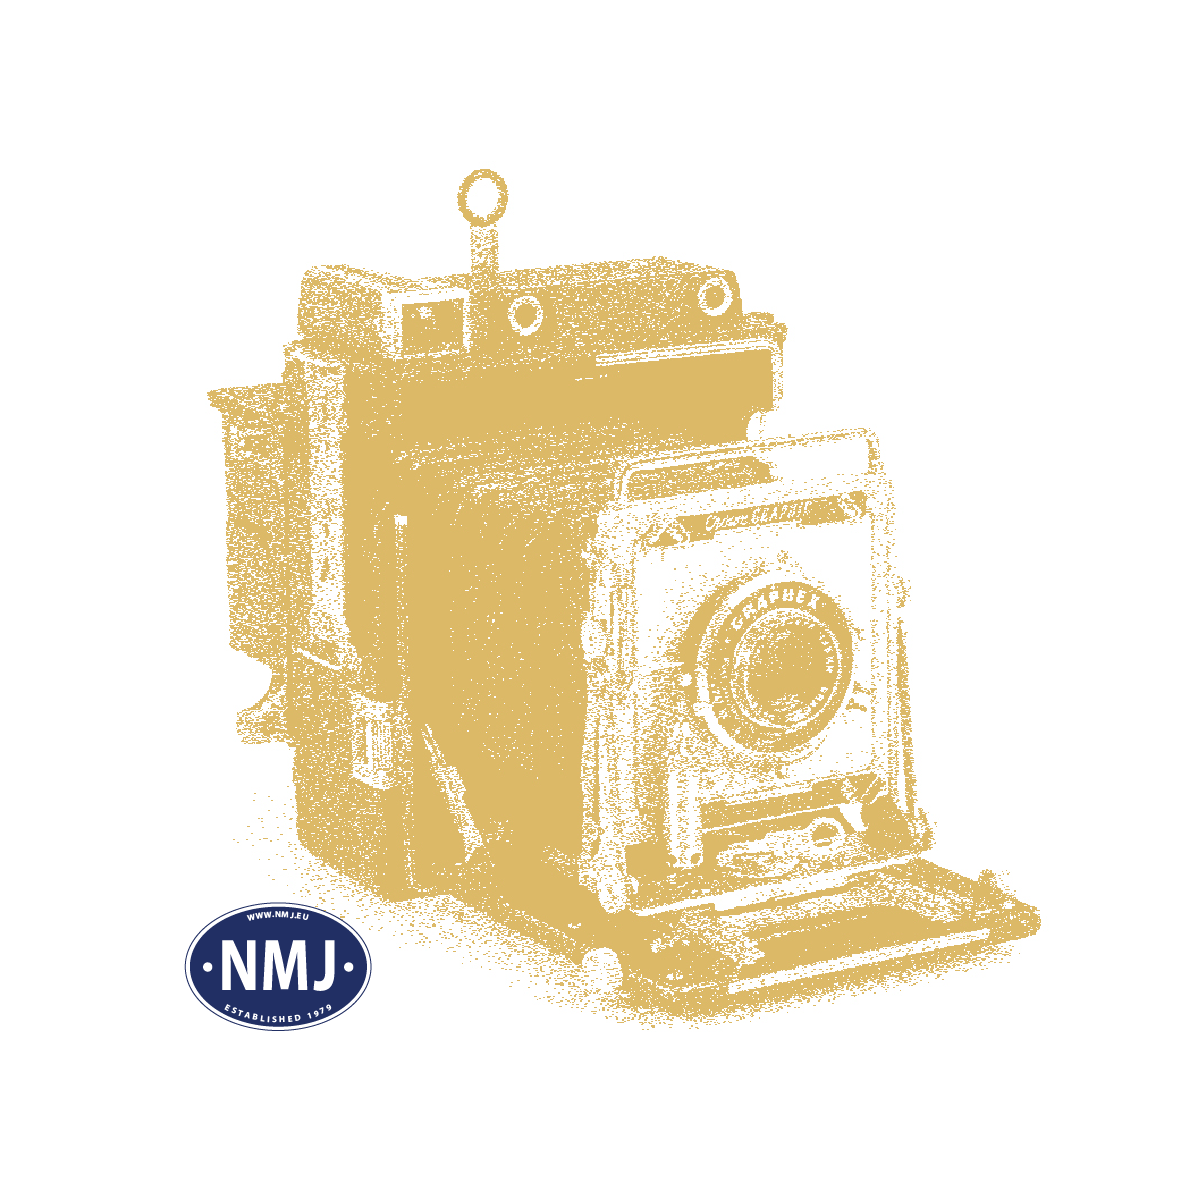 NMJT90202 - NMJ Topline MAV M61.010, Nohab, DCC w/ Sound